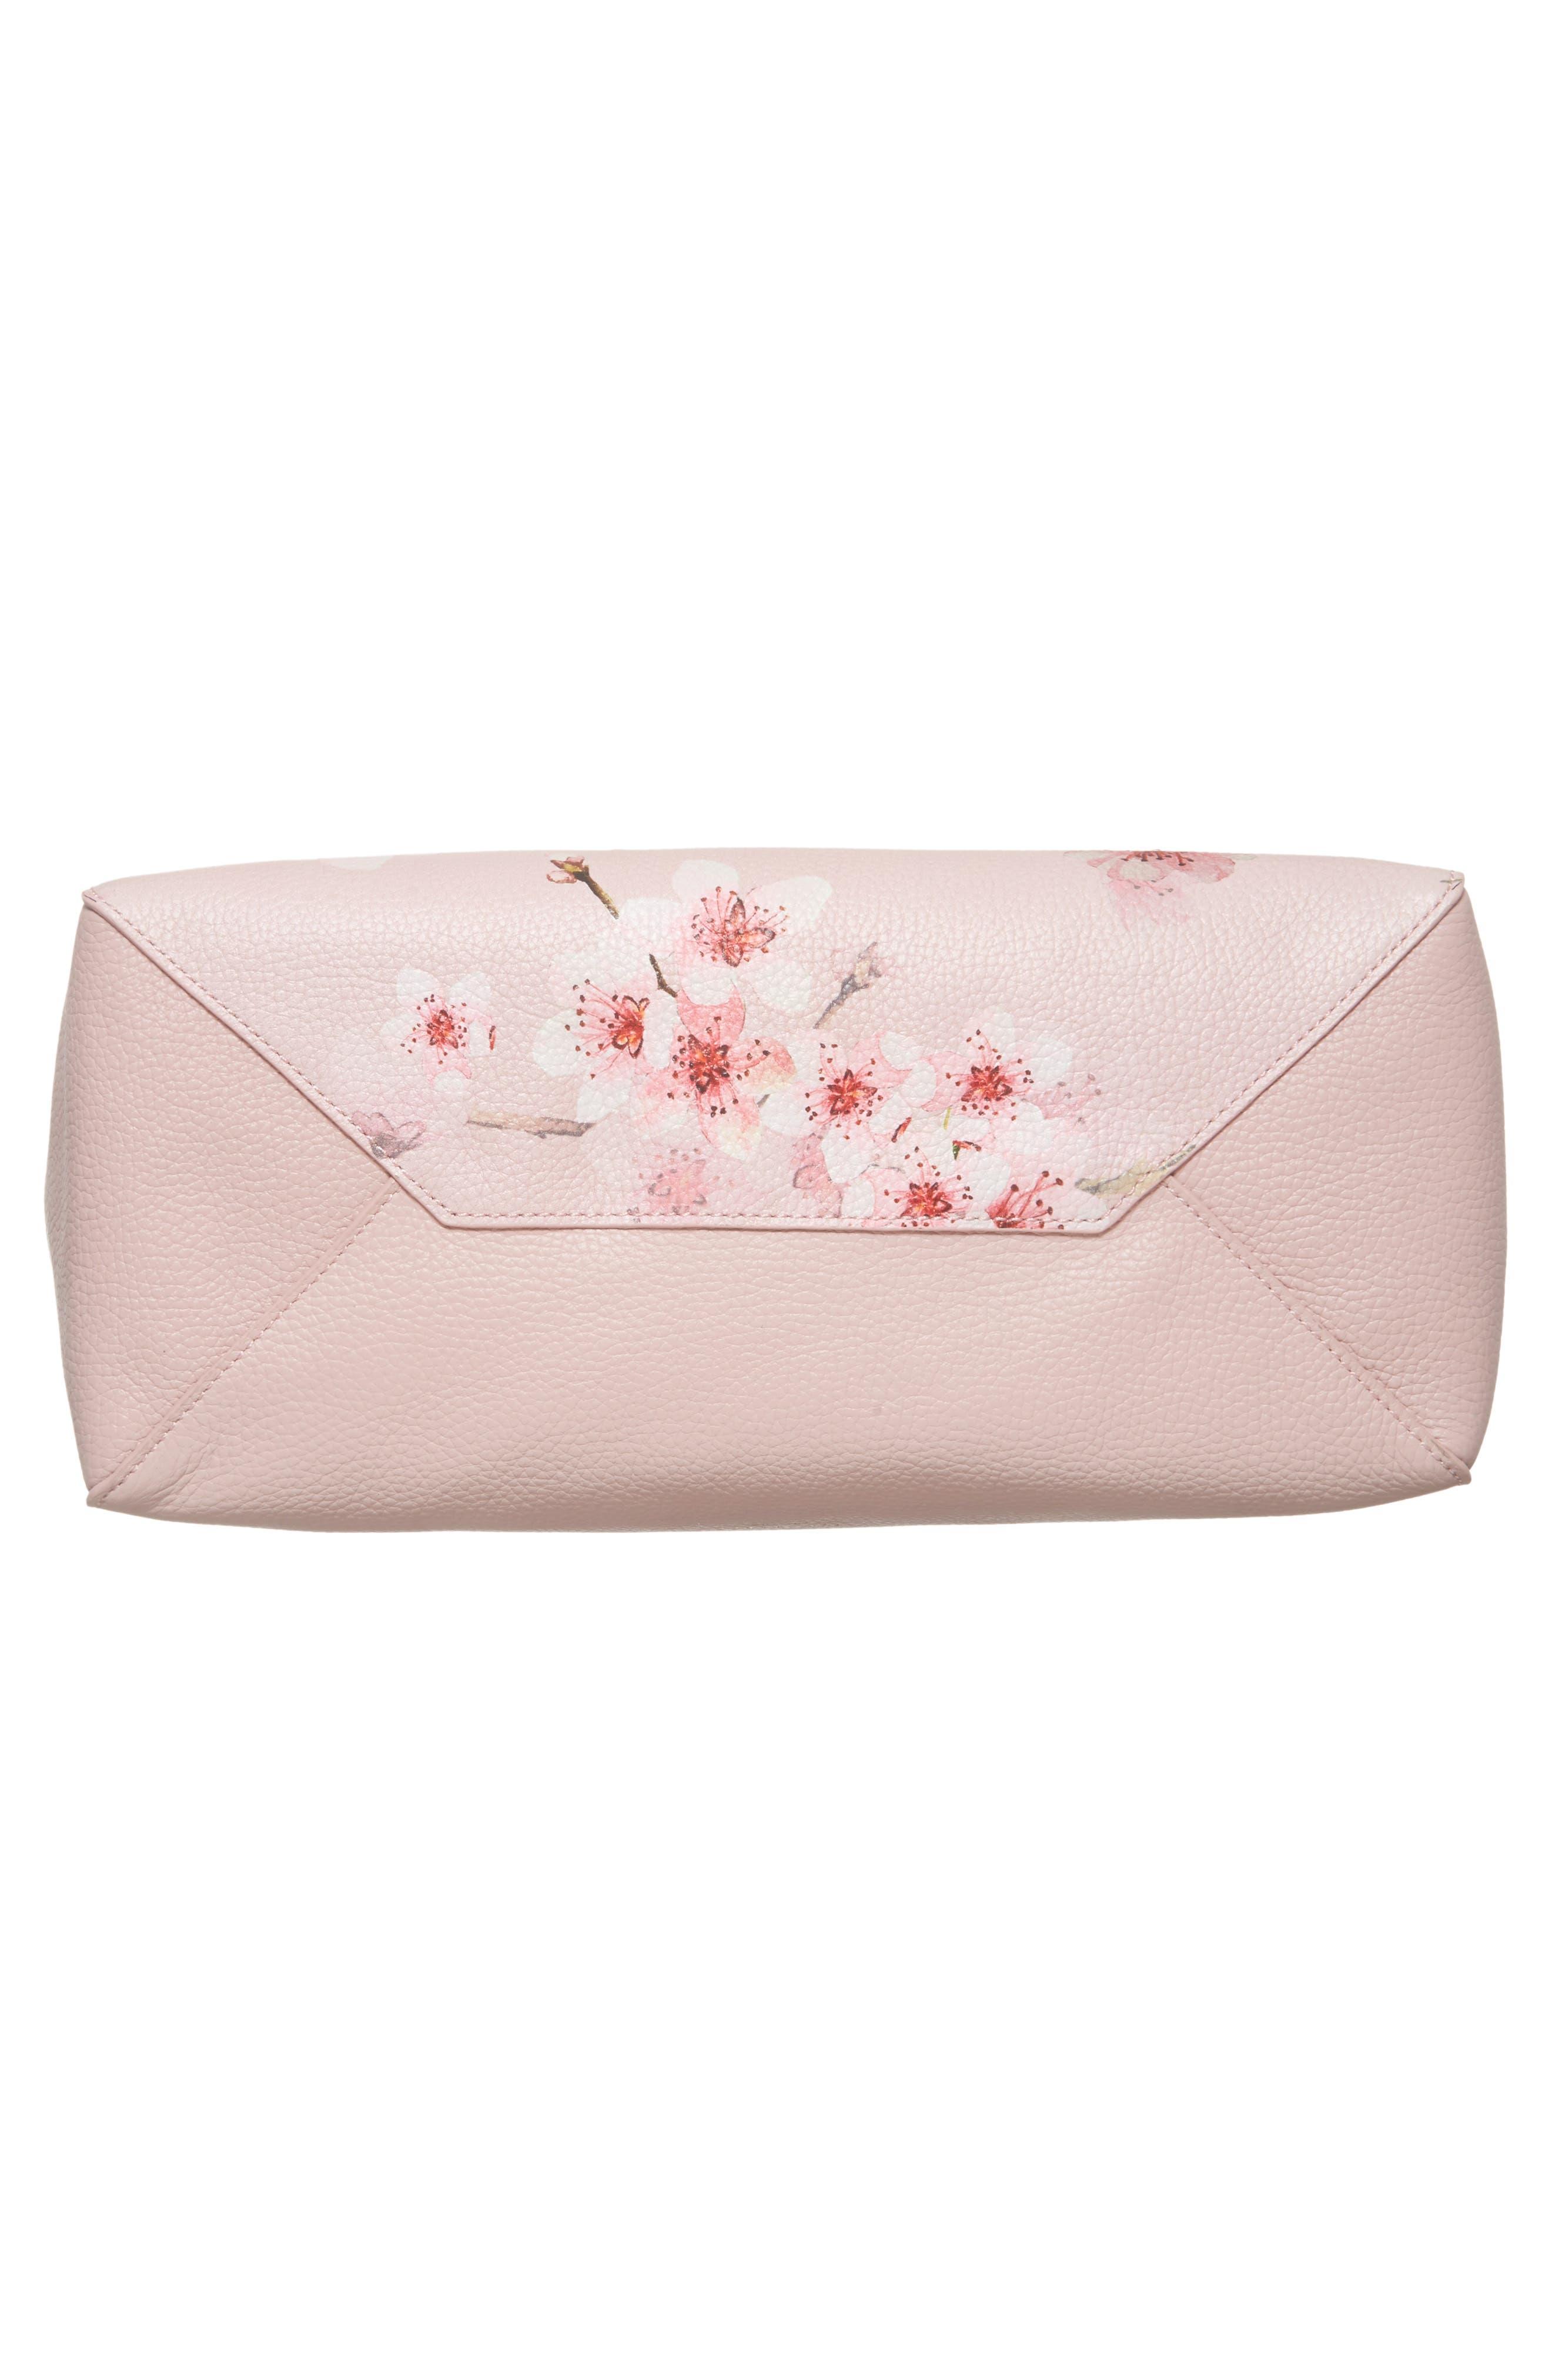 Soft Blossom Leather Shopper,                             Alternate thumbnail 6, color,                             Light Pink